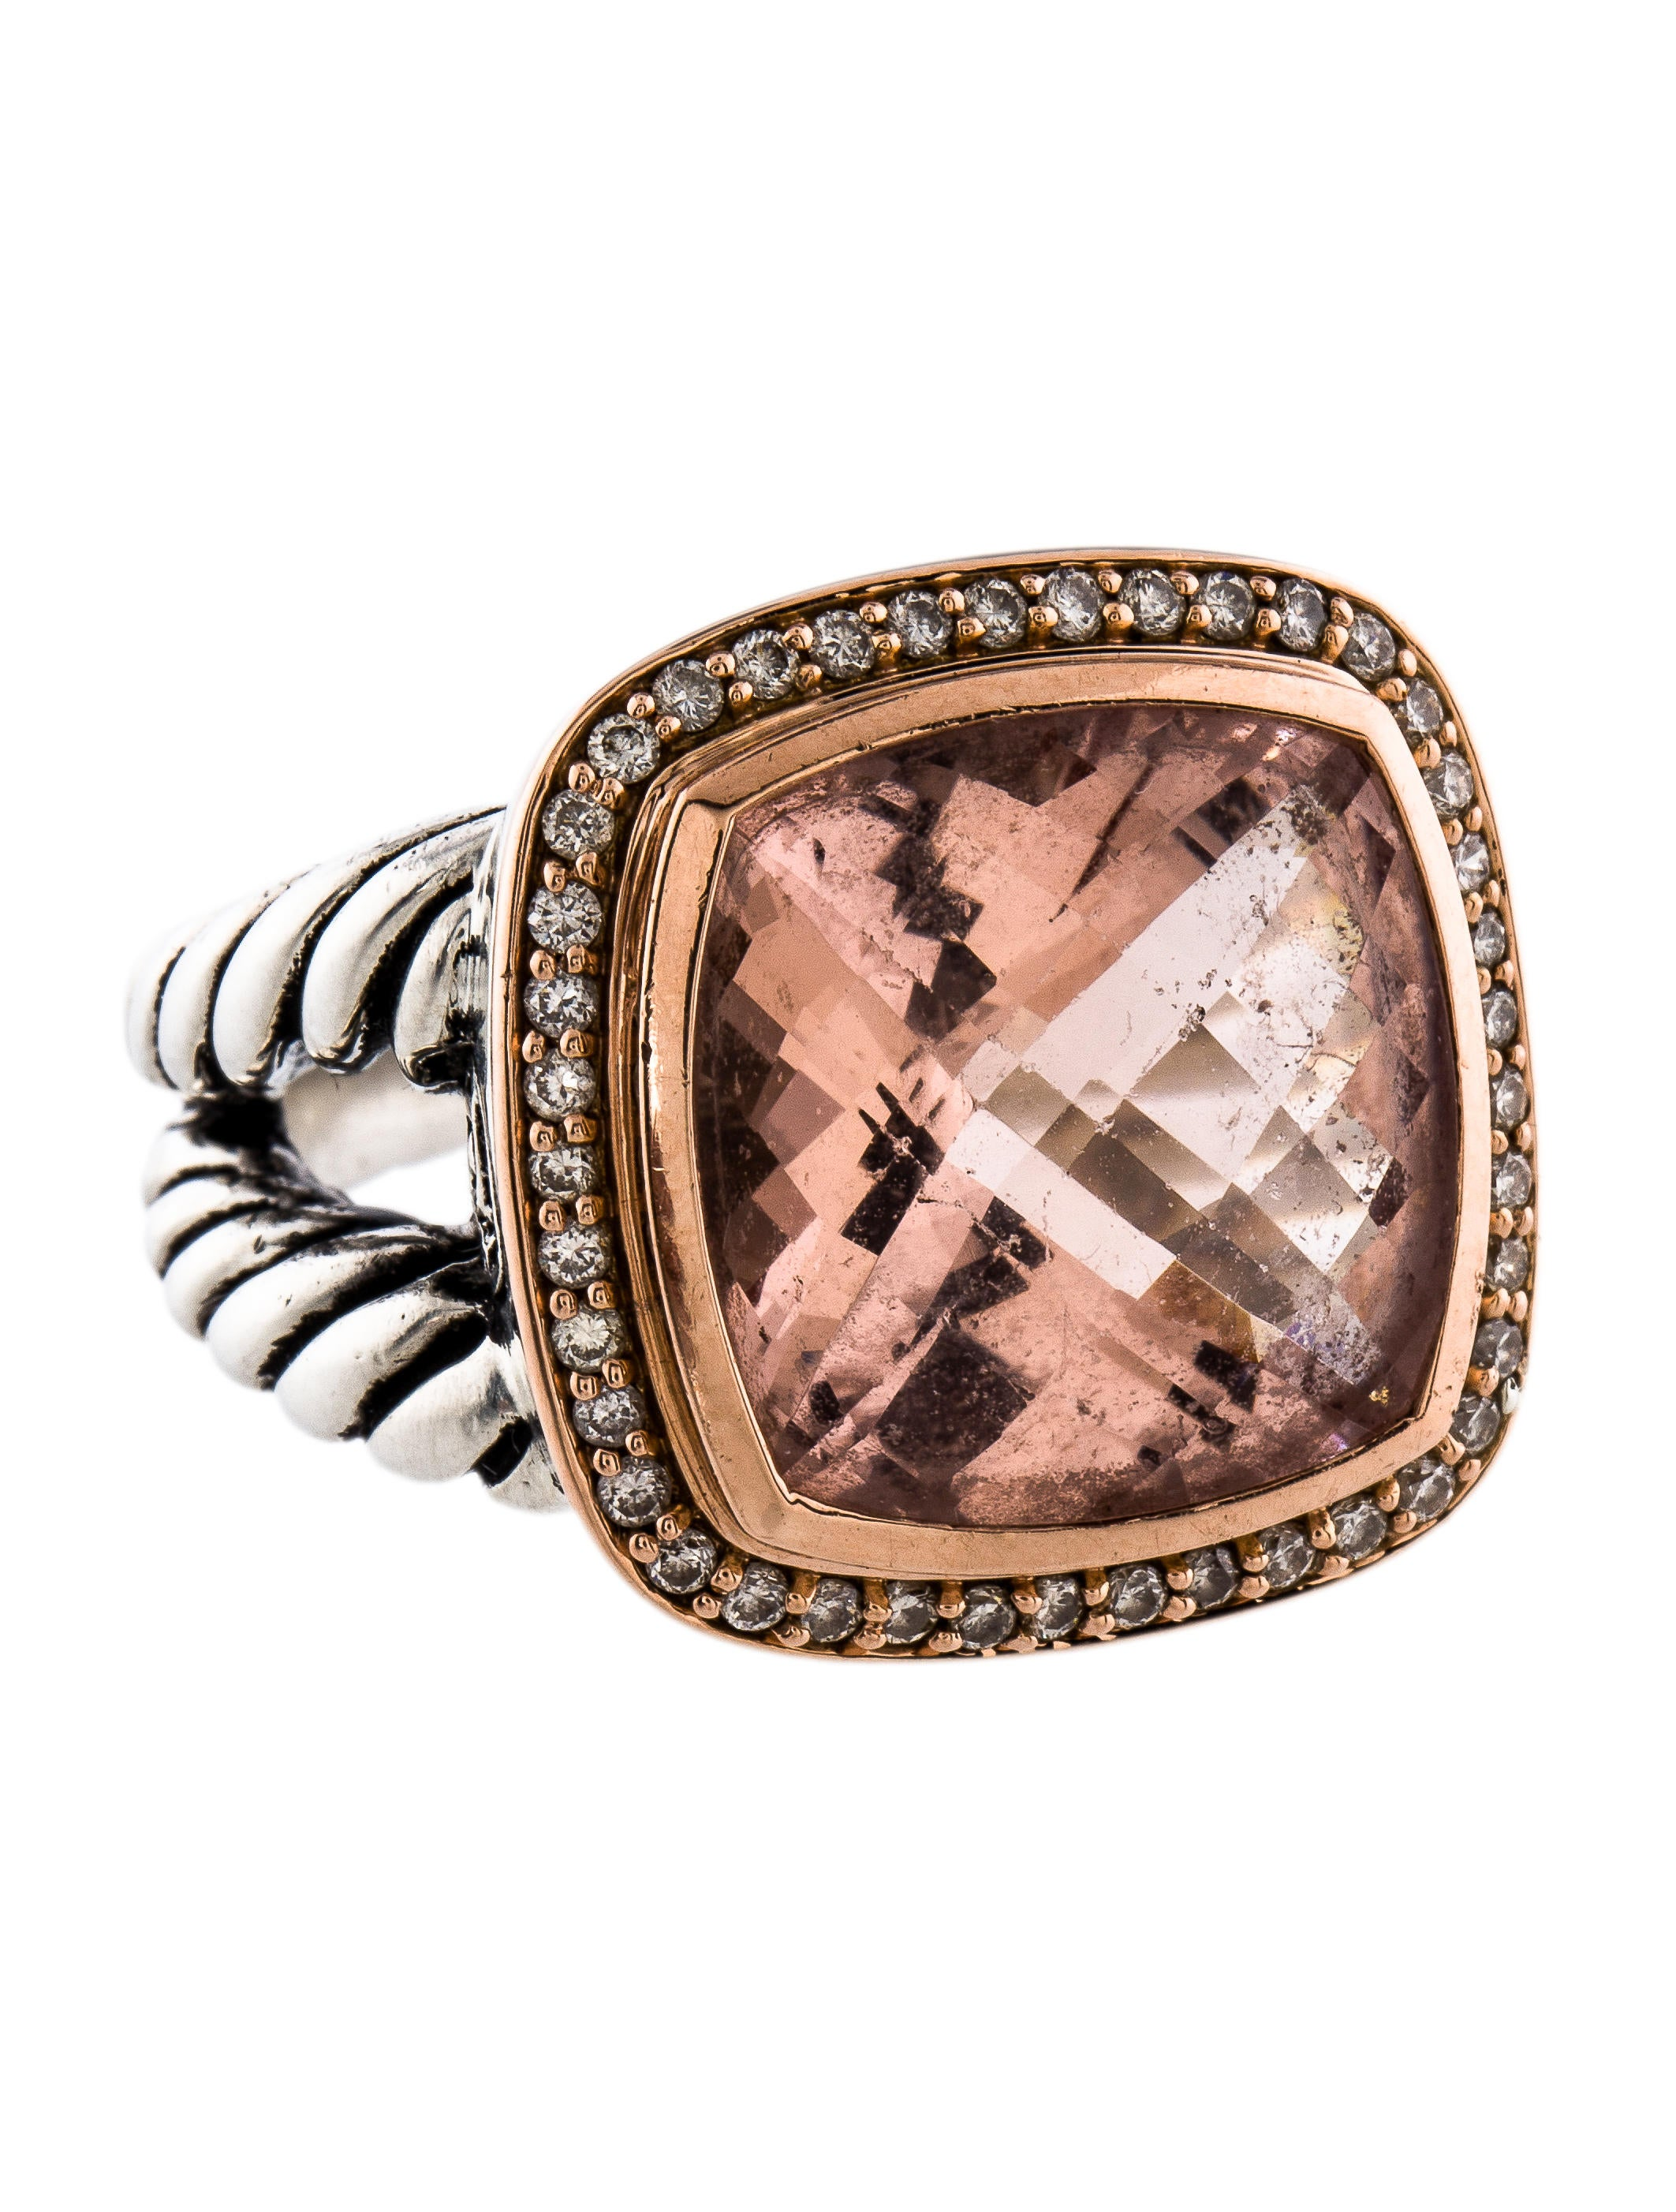 David yurman morganite diamond albion ring rings for David yurman inspired jewelry rings